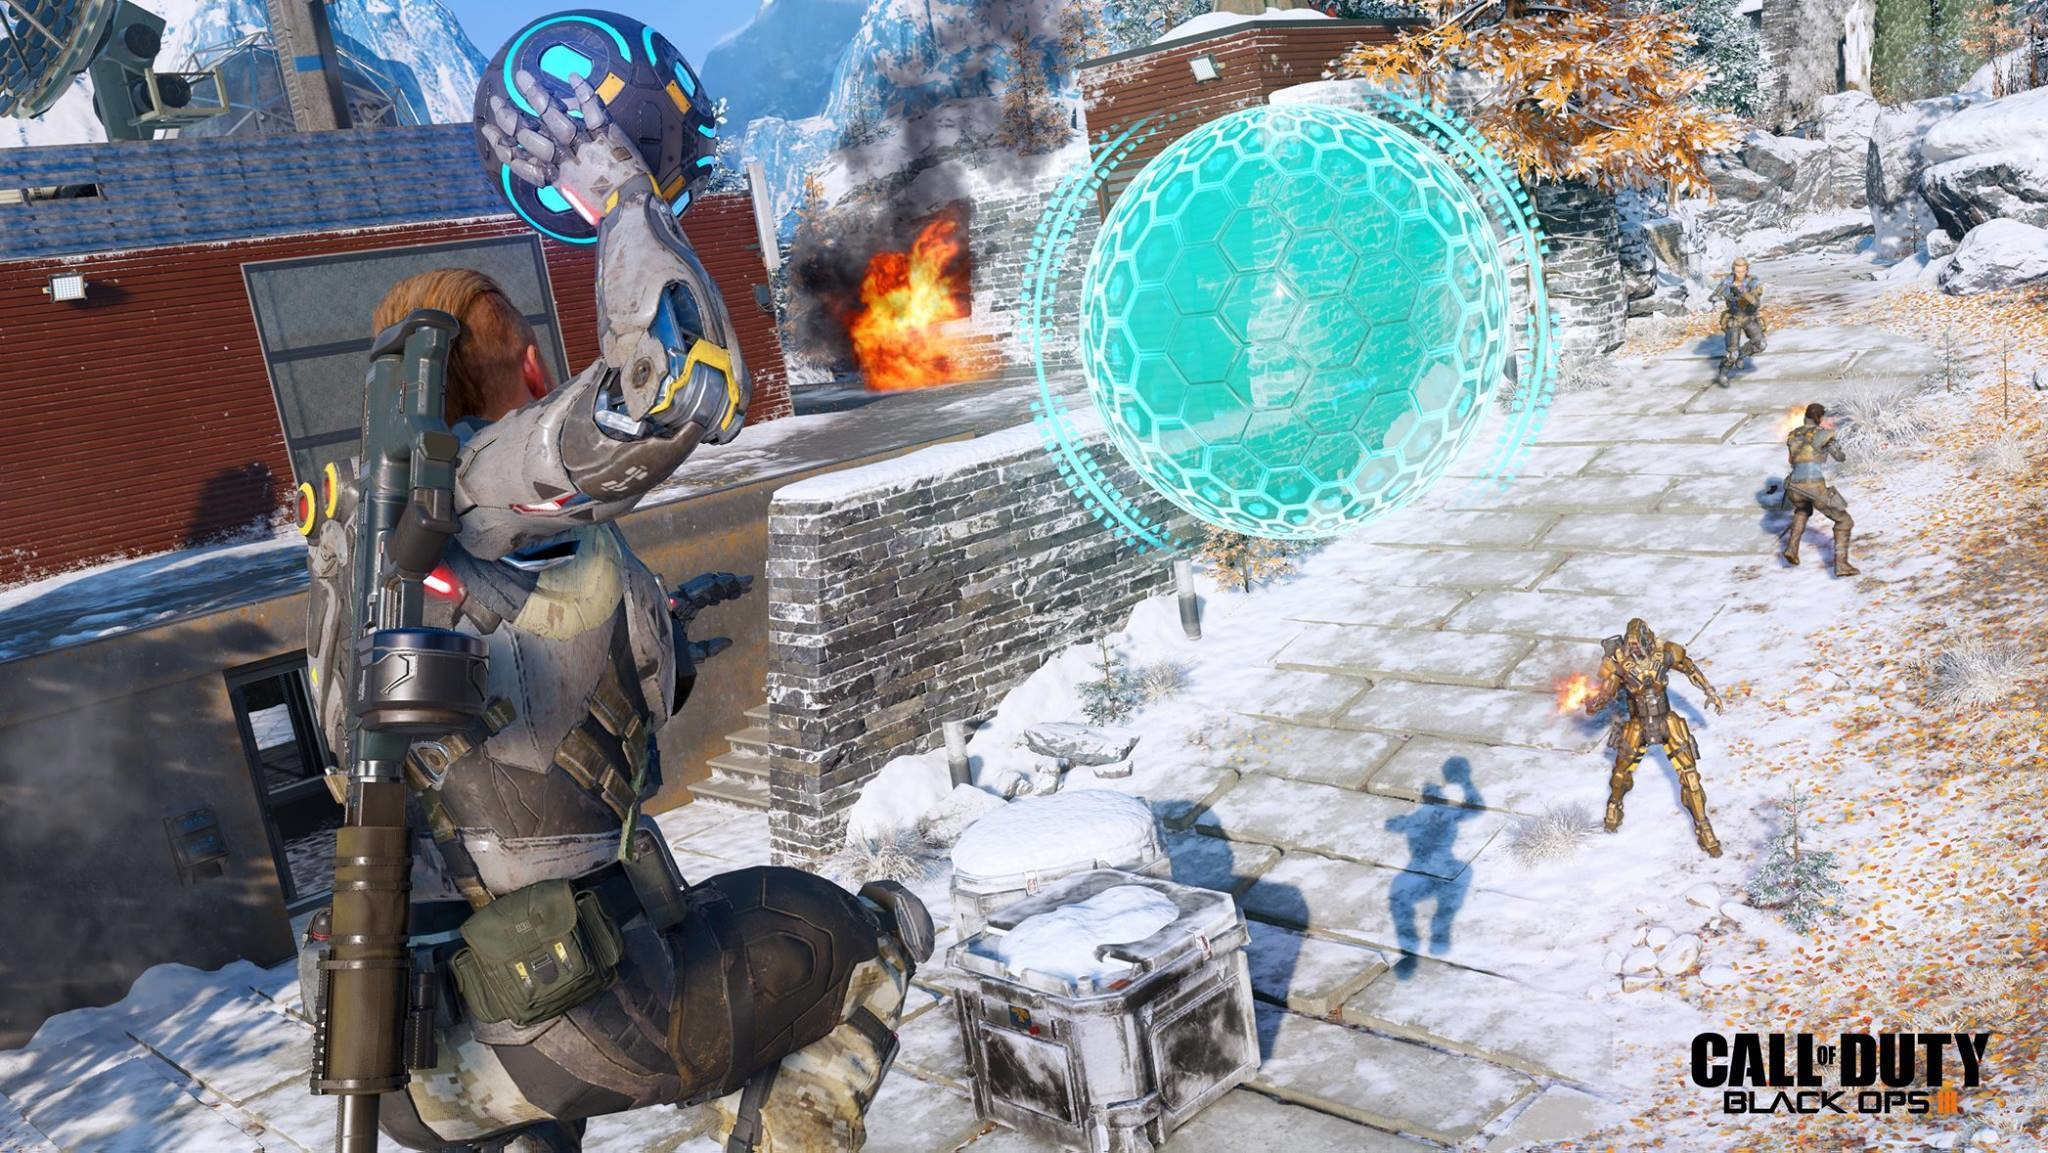 Black Ops 3 New Screenshots and Wallpaper